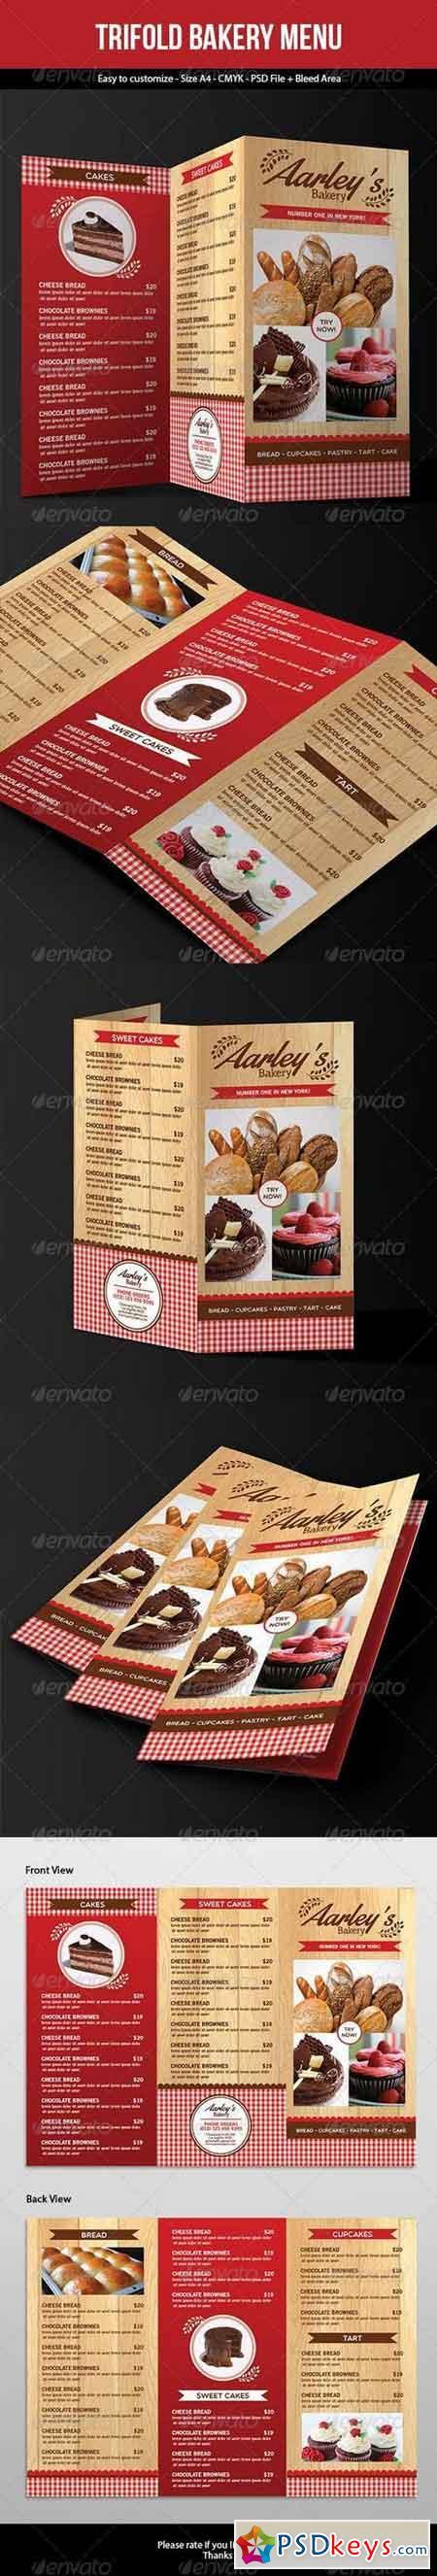 Trifold Bakery Menu 7299857